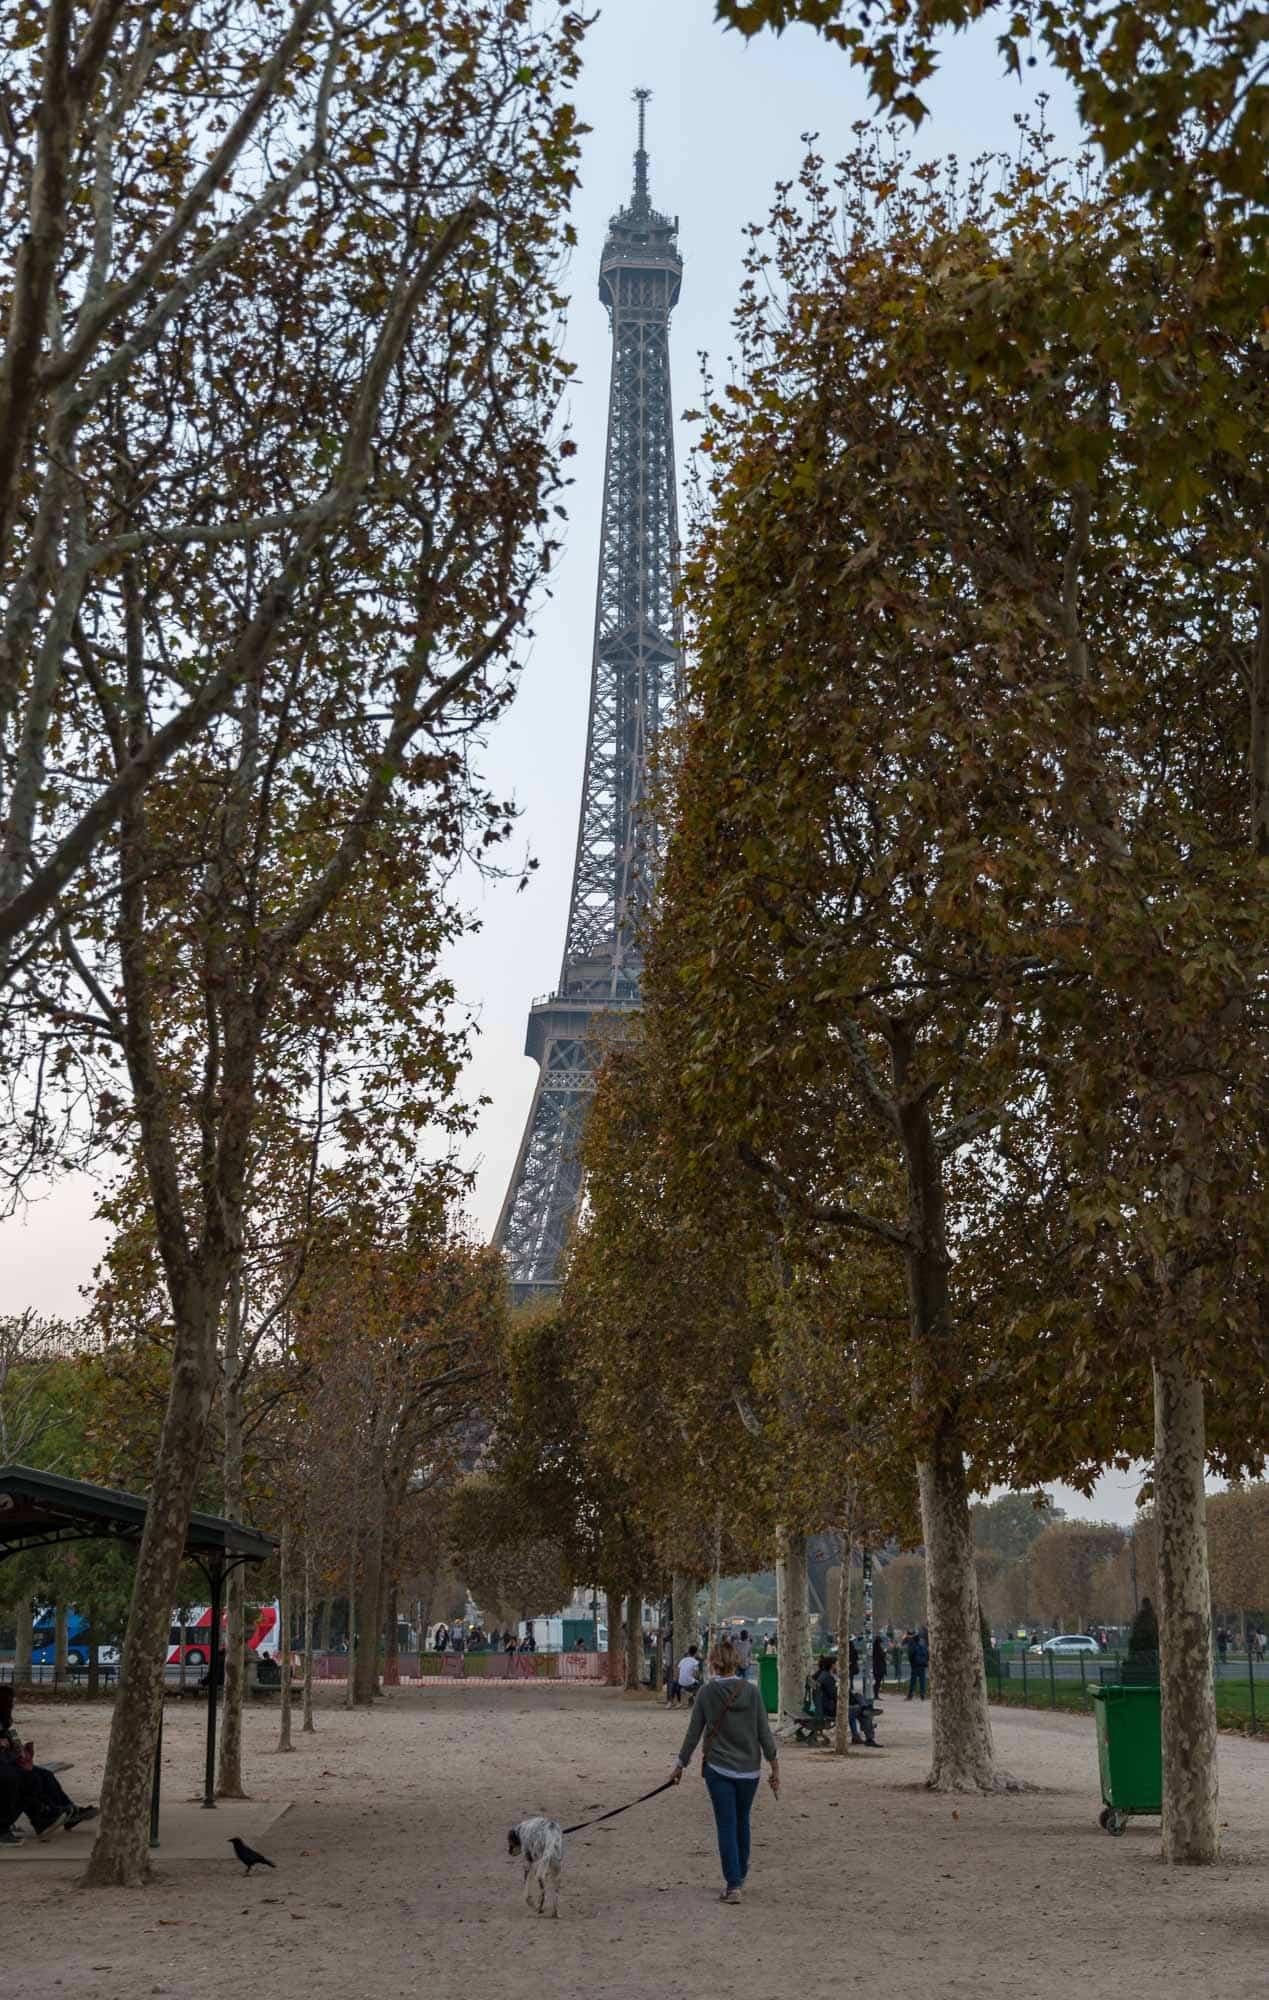 beautiful view of Eiffel tower